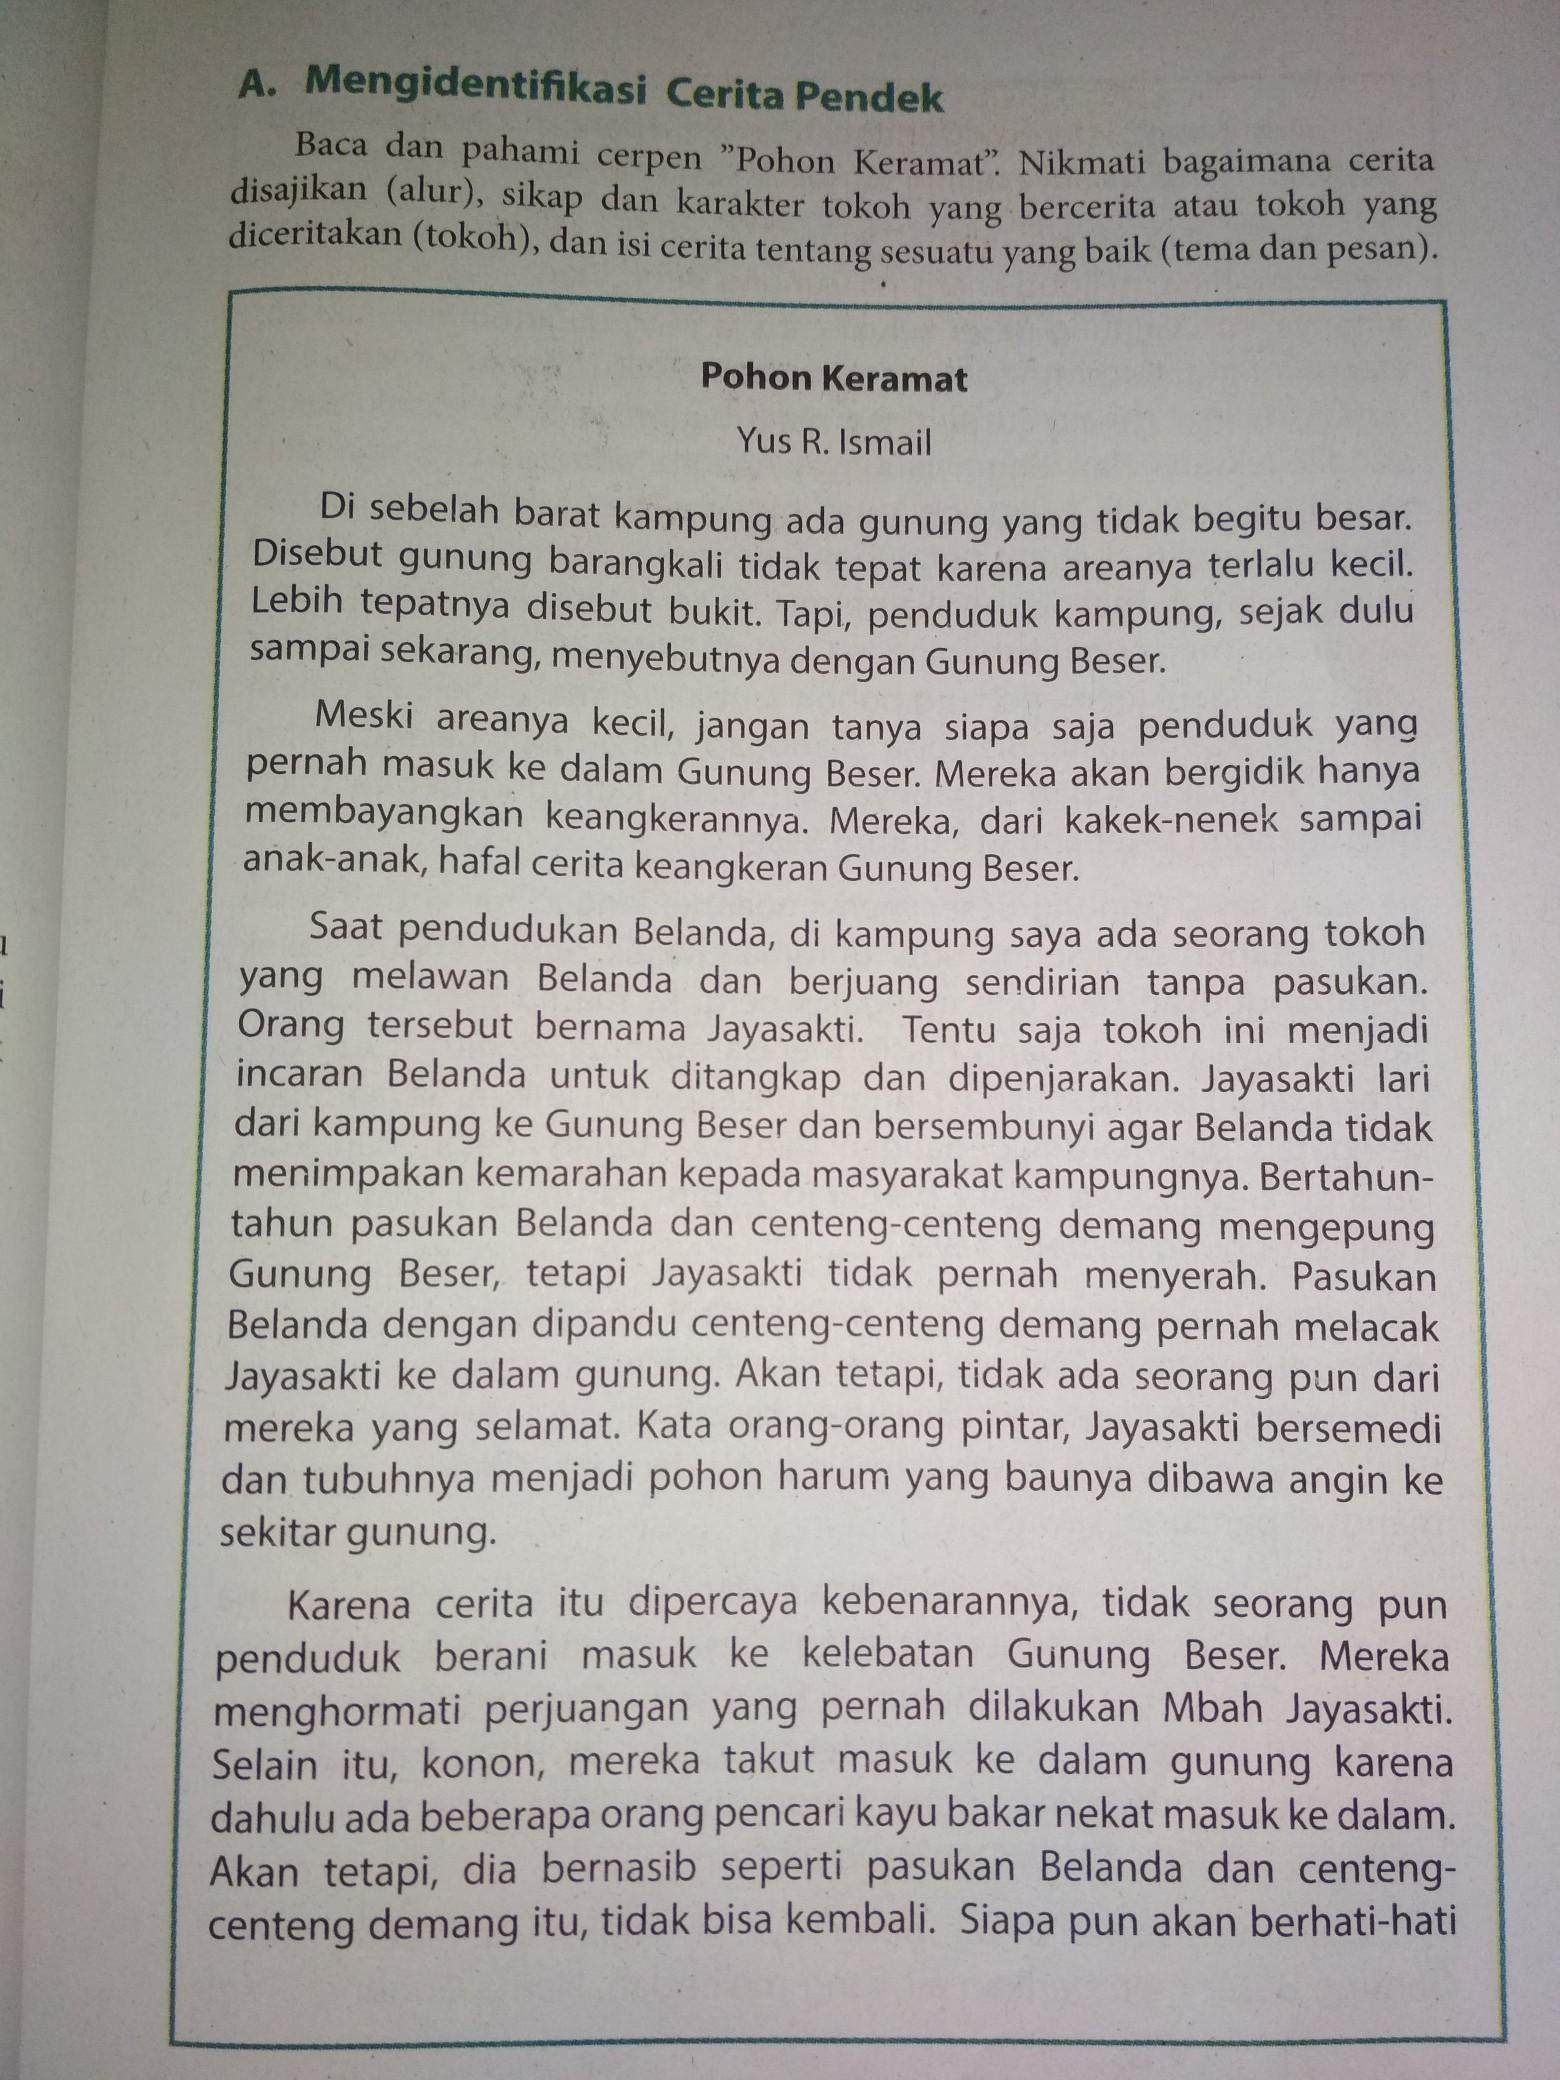 Buku Kelas 9 Bahasa Indonesia Kurikulum 2013cerita Pendek Pohon